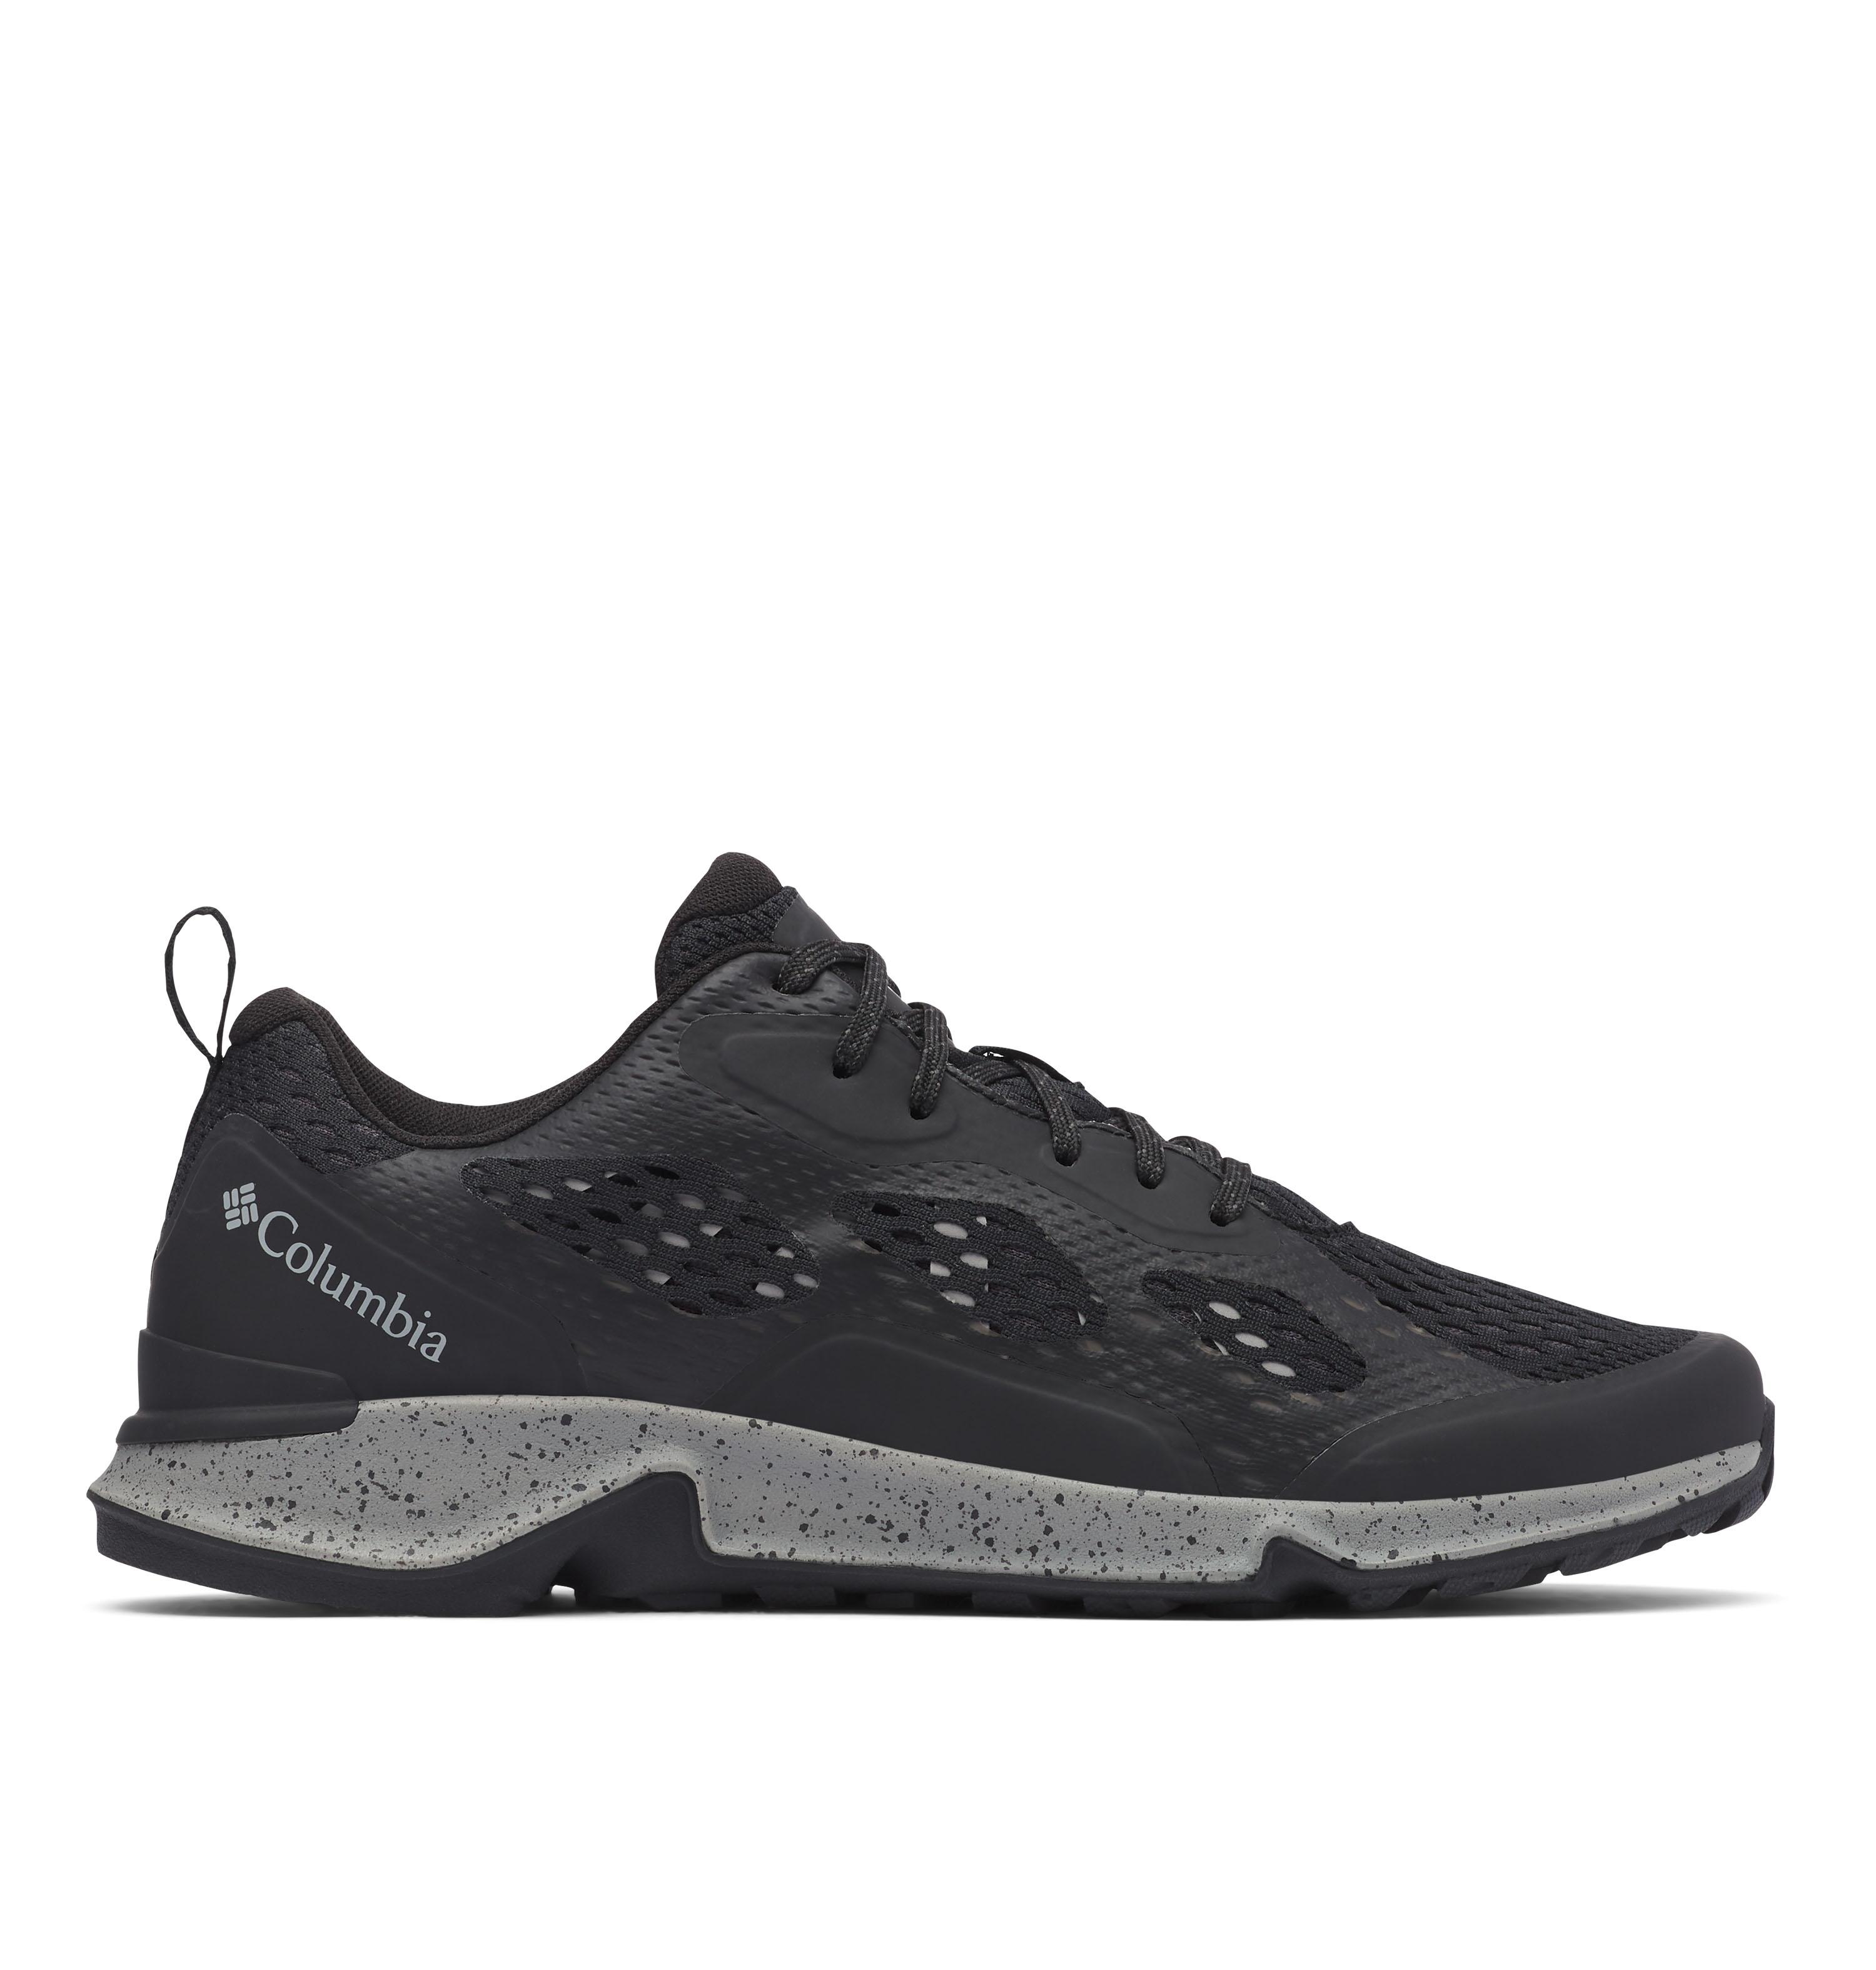 Comprar Columbia Vitesse preto / Omni-Grip sapatos /